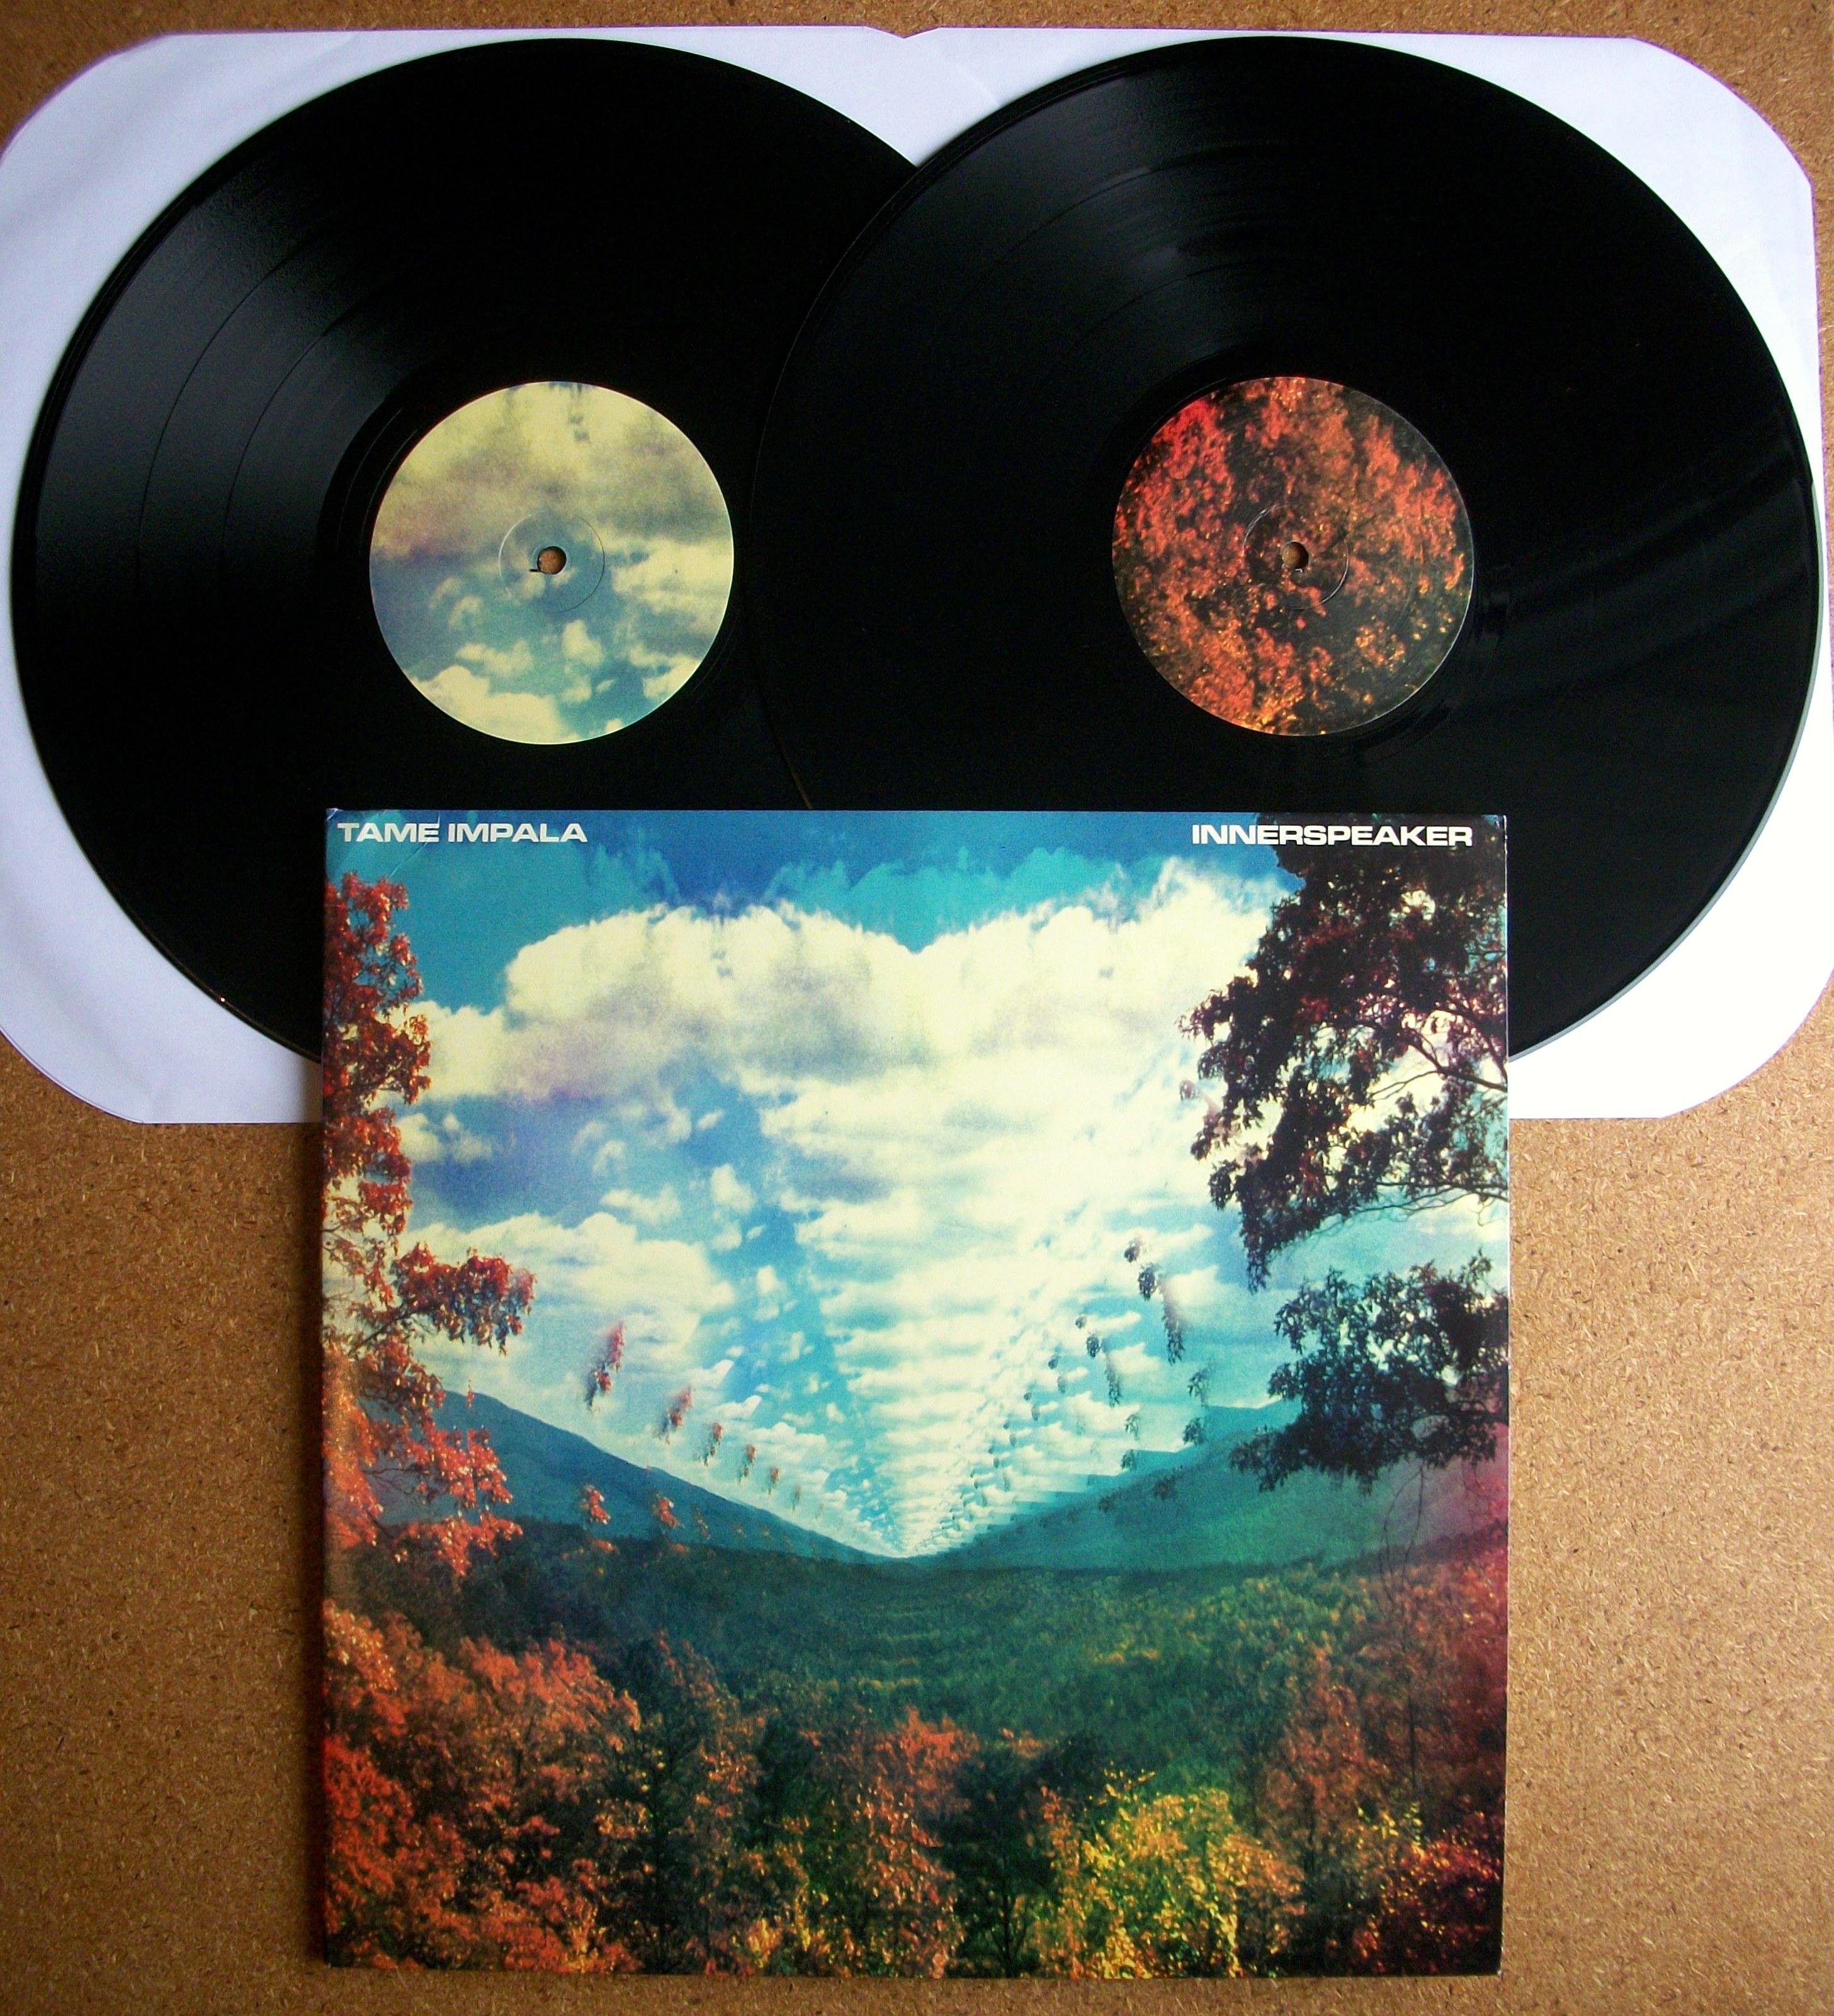 Sinister Vinyl Collection Tame Impala Innerspeaker